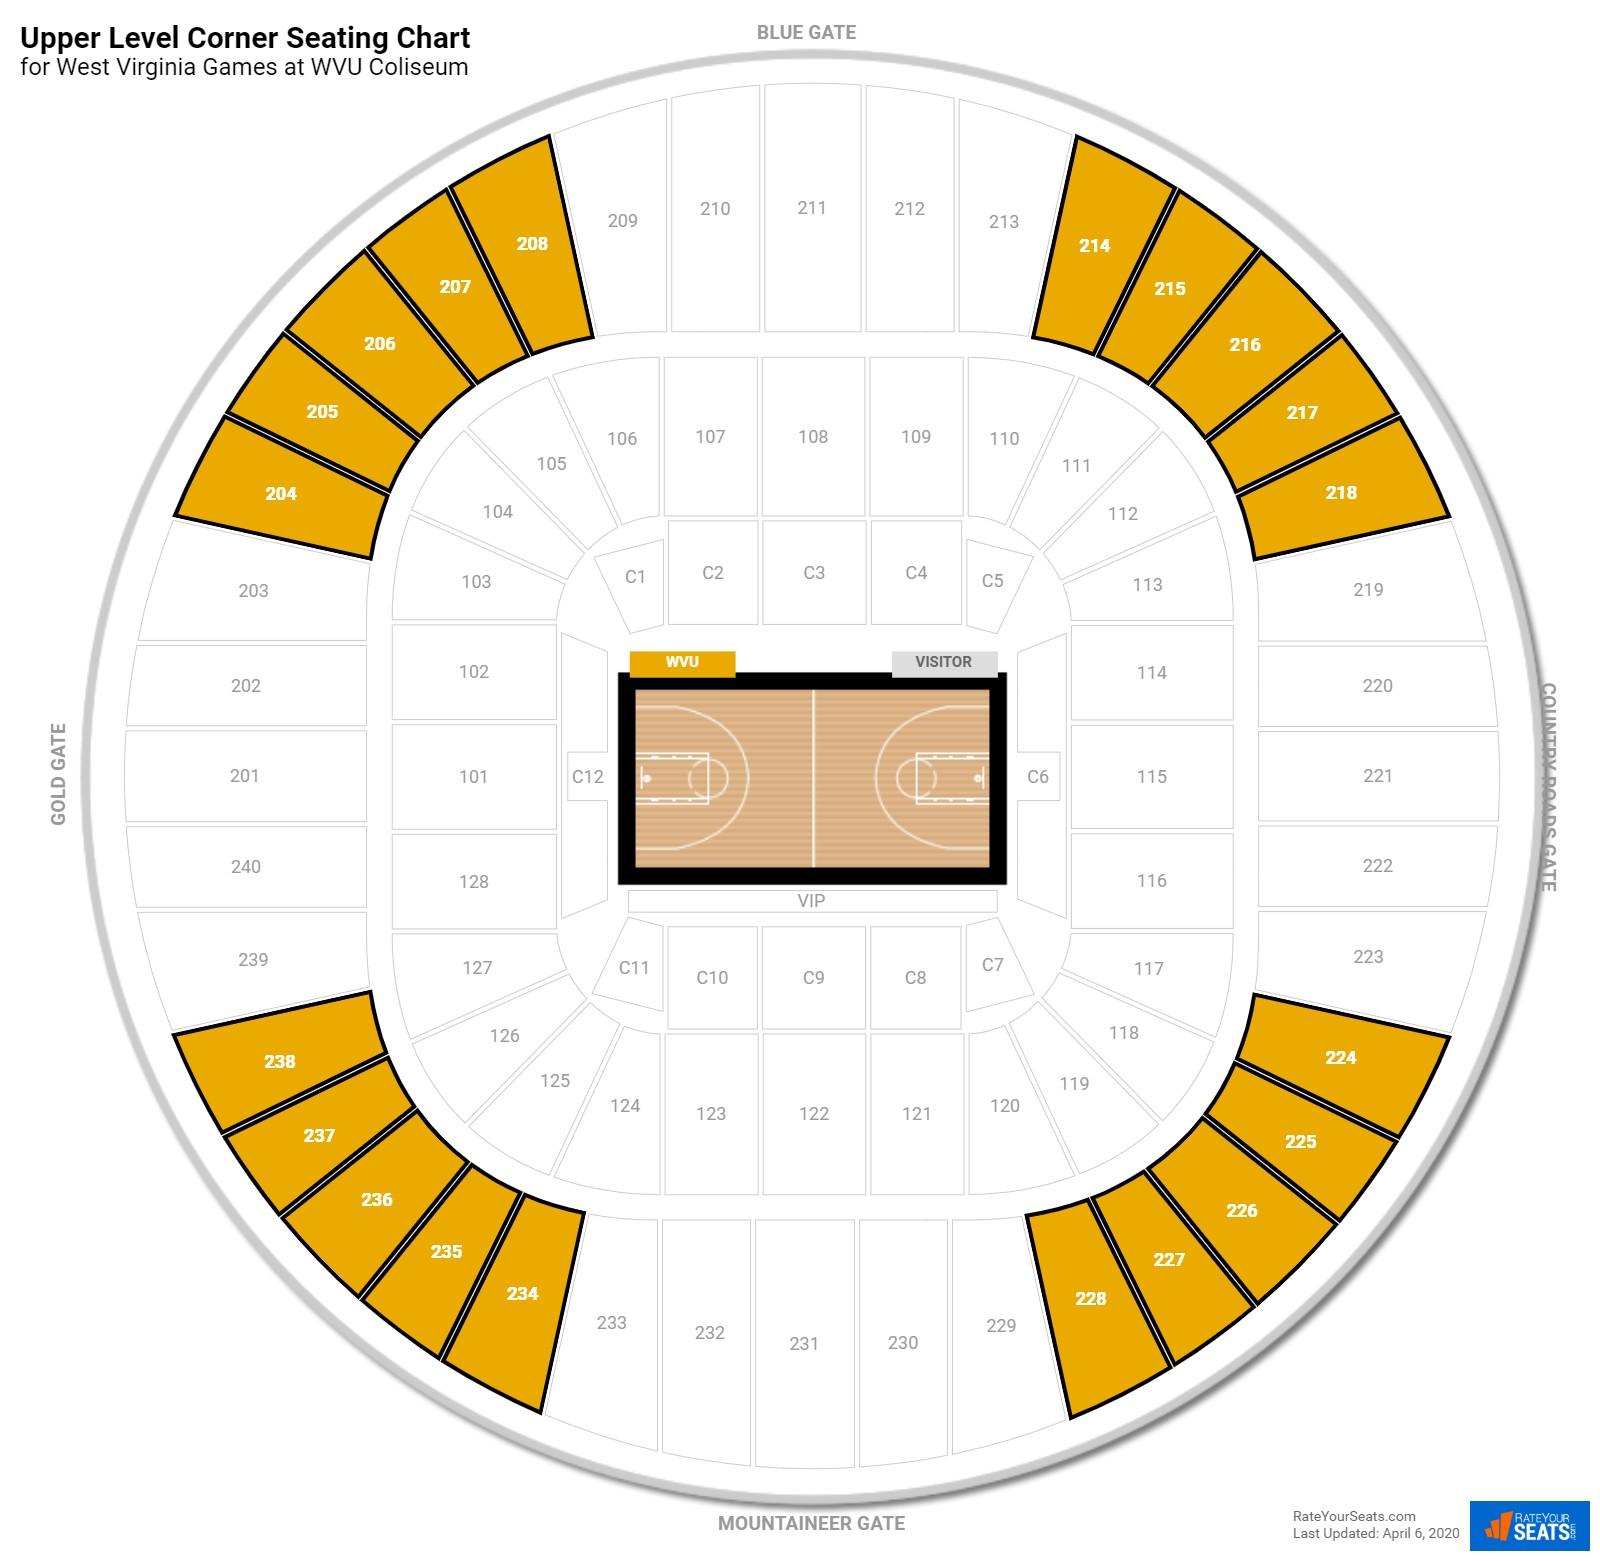 Wvu coliseum west virginia seating guide rateyourseats com